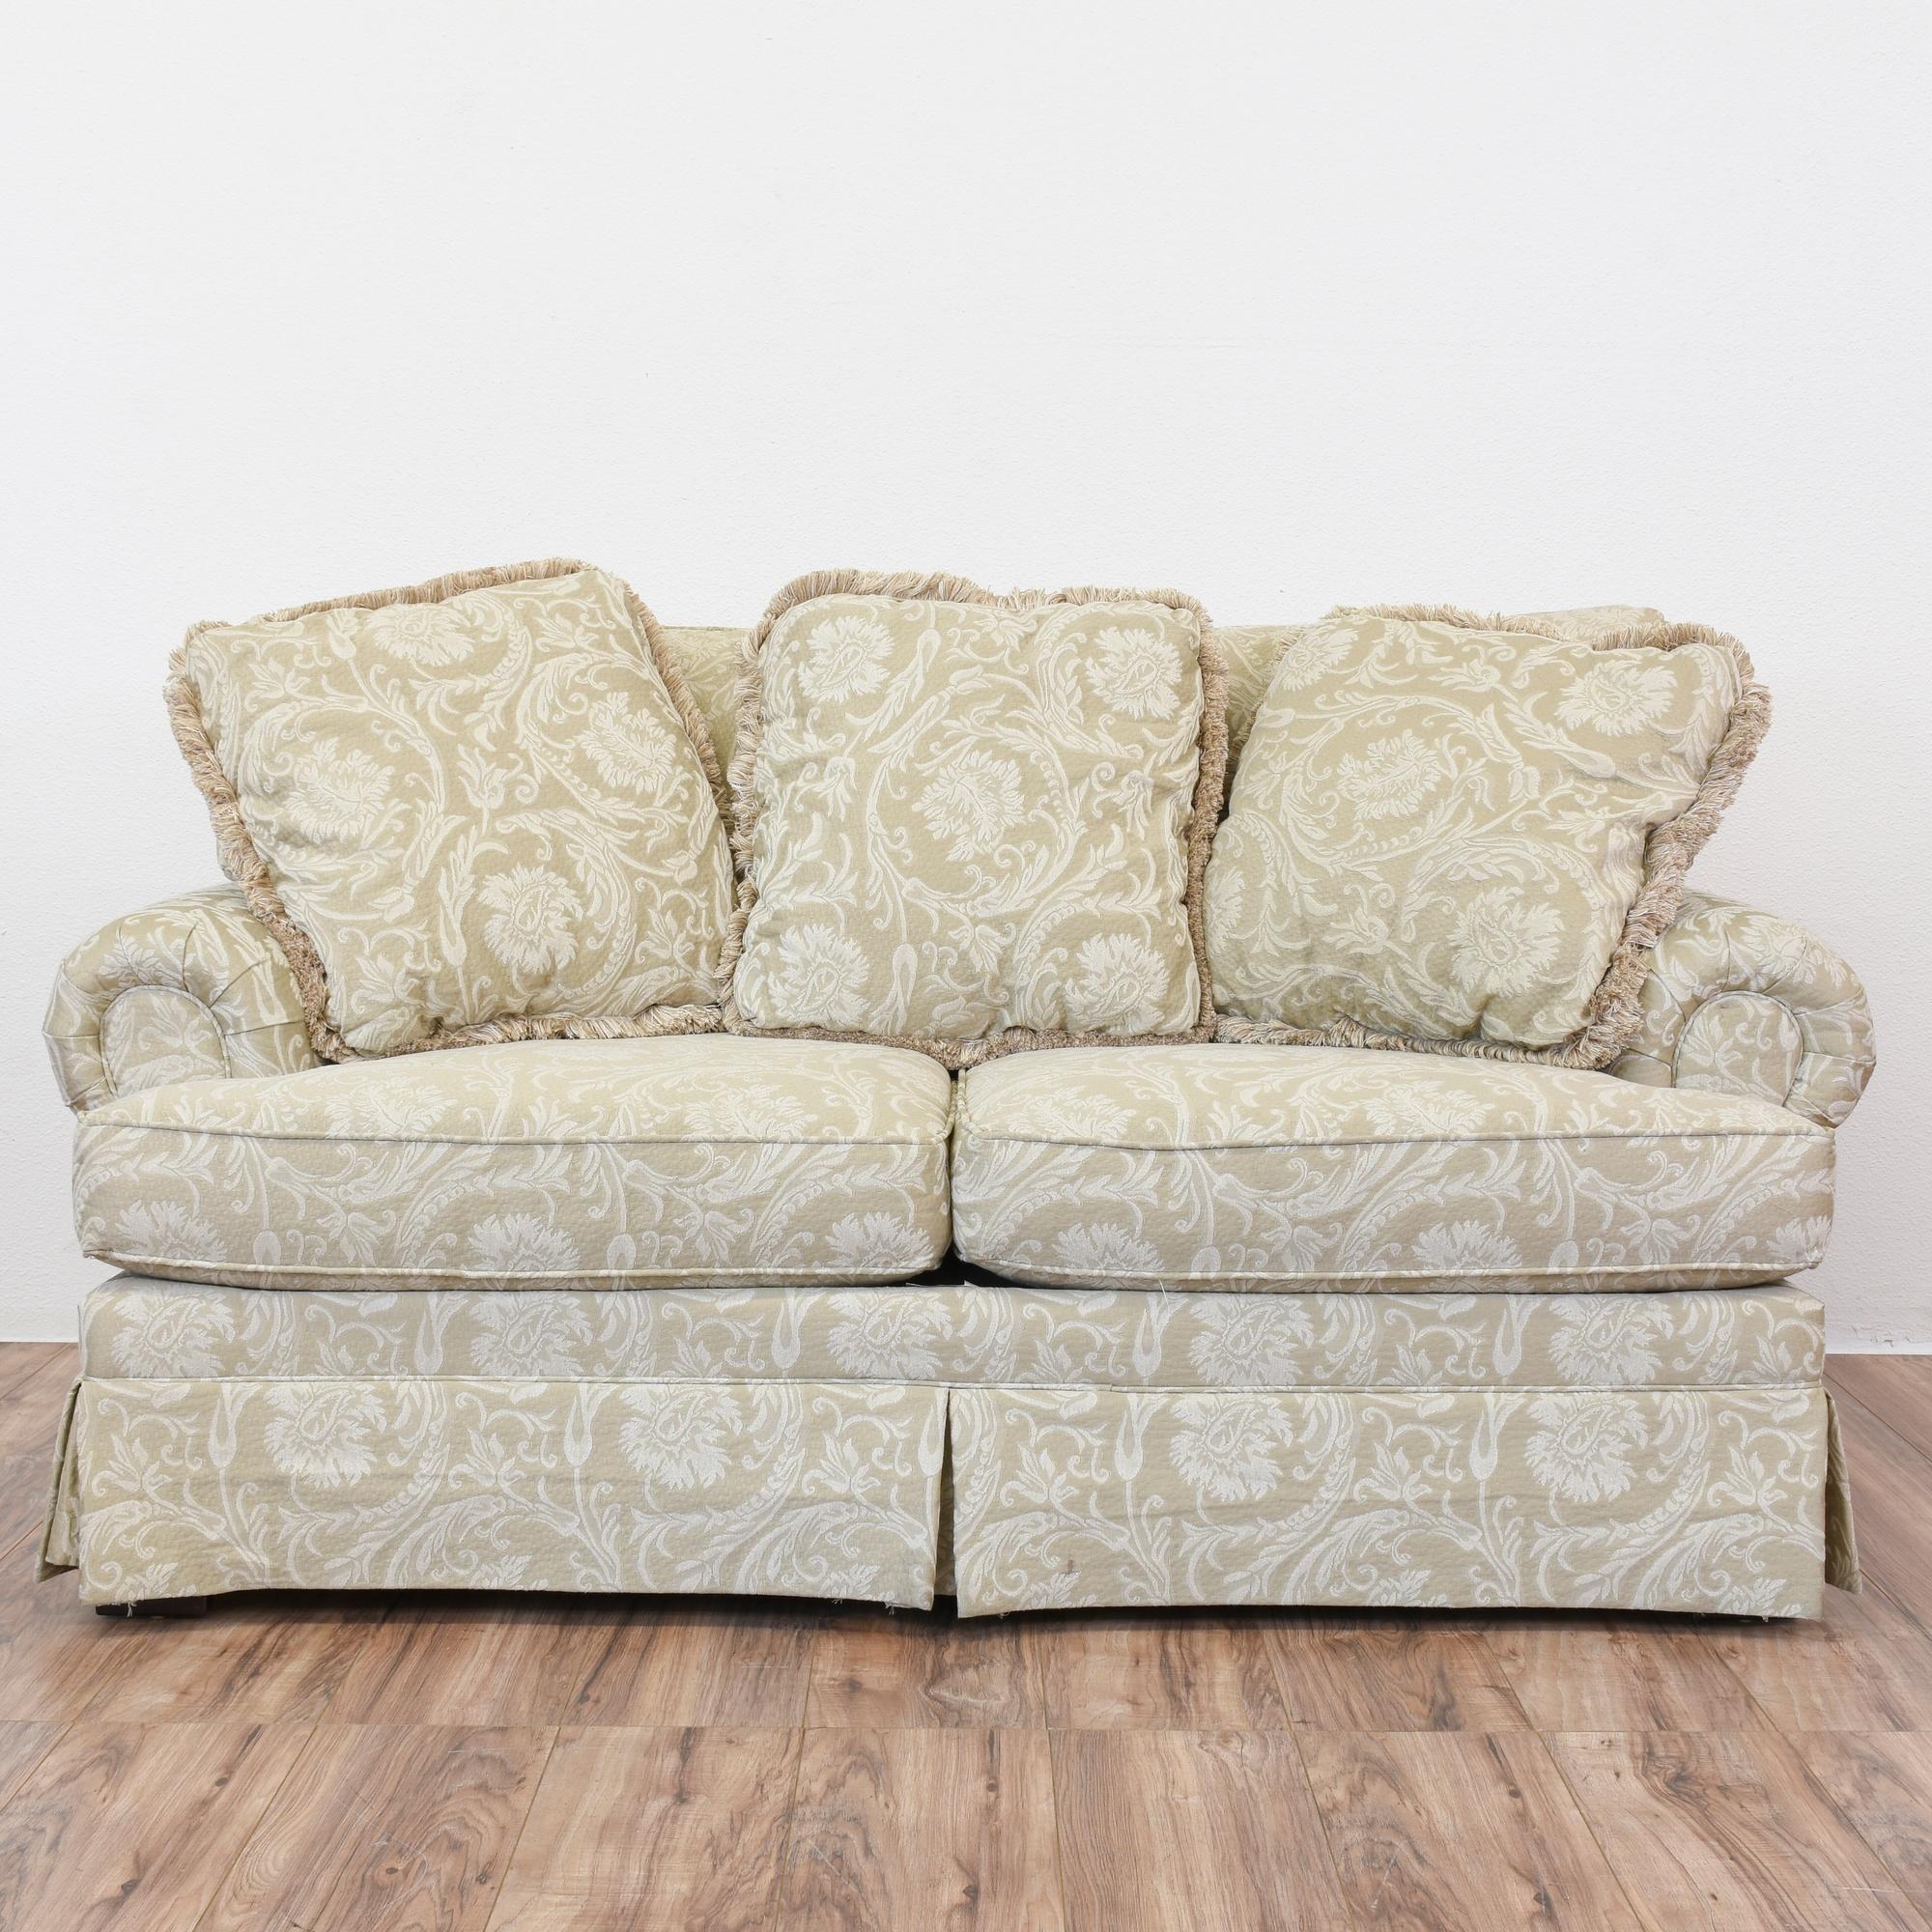 Beige Damask Loveseat Sofa   Loveseat Vintage Furniture San Diego